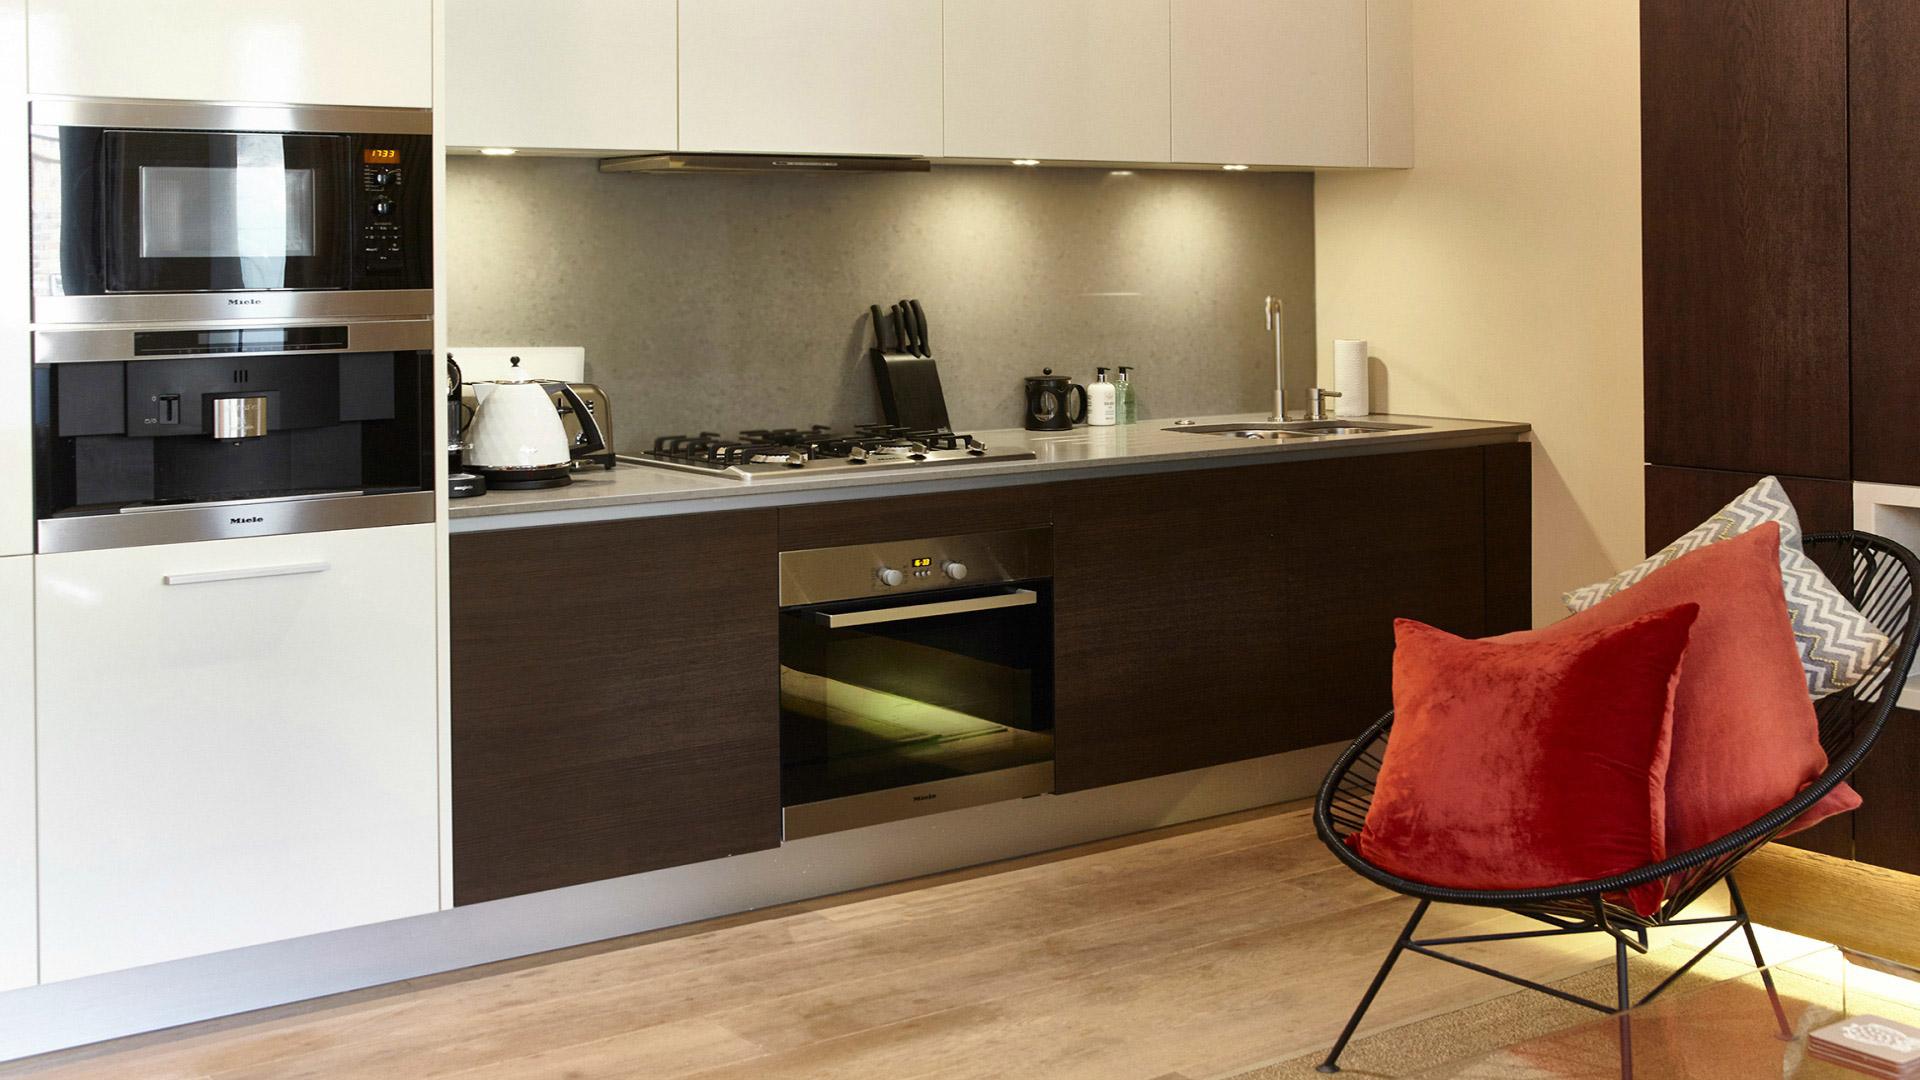 2 bedroom 2 bathroom vacation apartment in chelsea london - 2 bedroom apartment for rent in chelsea ma ...